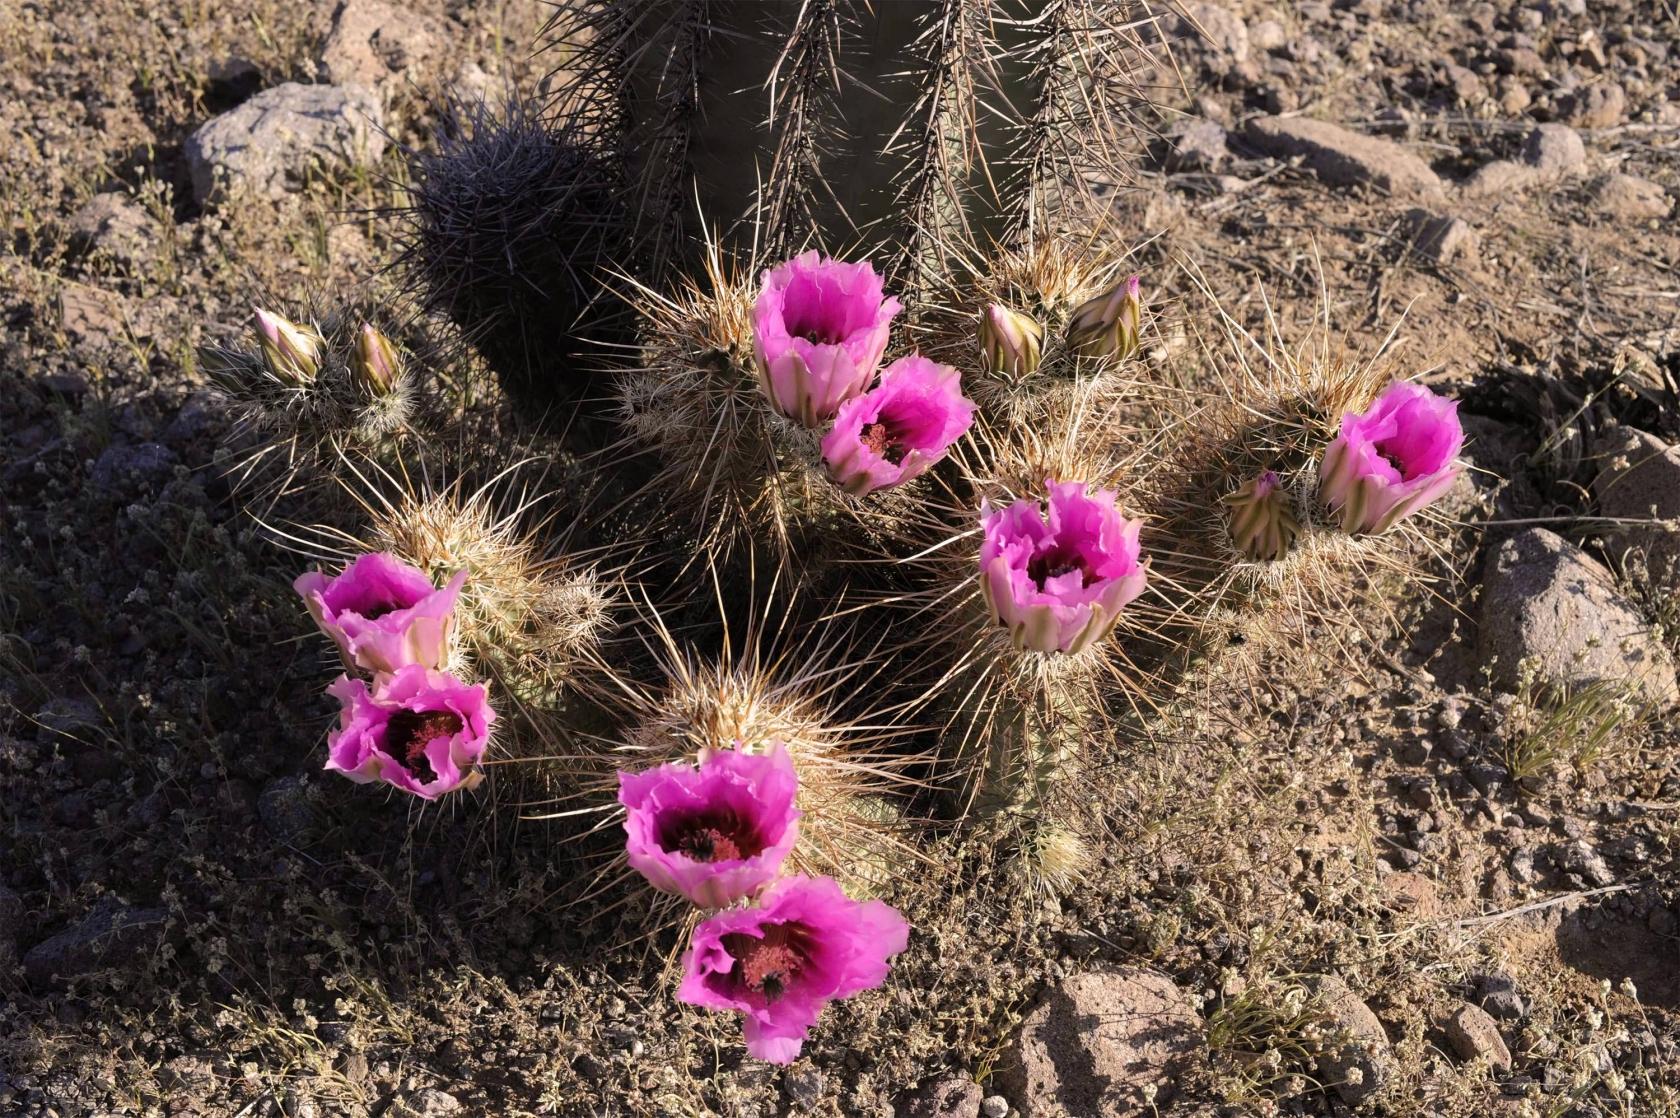 Rosa flores del cactus de erizo